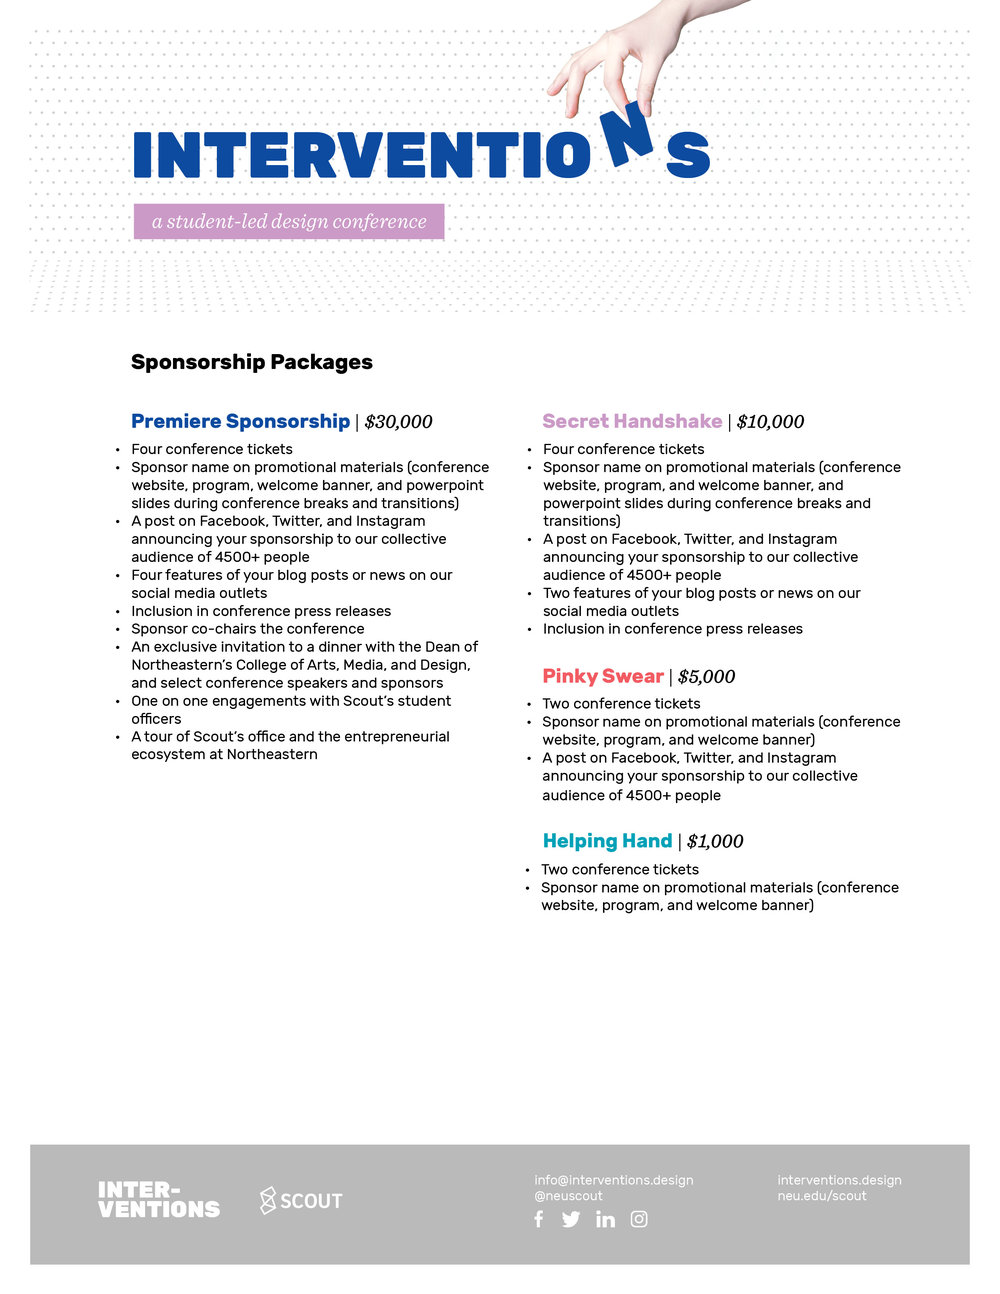 Interventions_SponsorshipPackages_f4.jpg